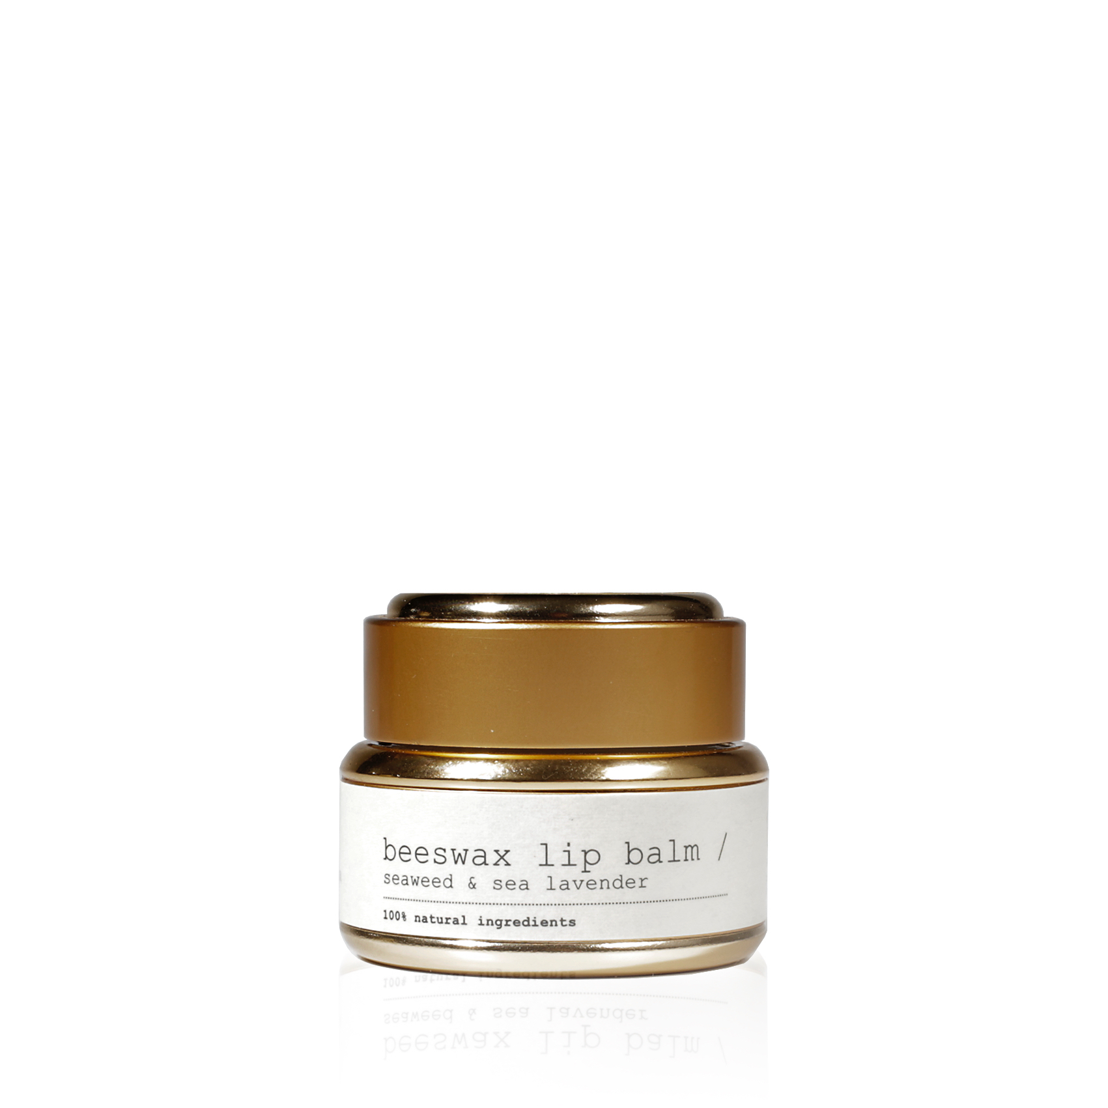 Seaweed / Sea Lavender Lip Balm - €20